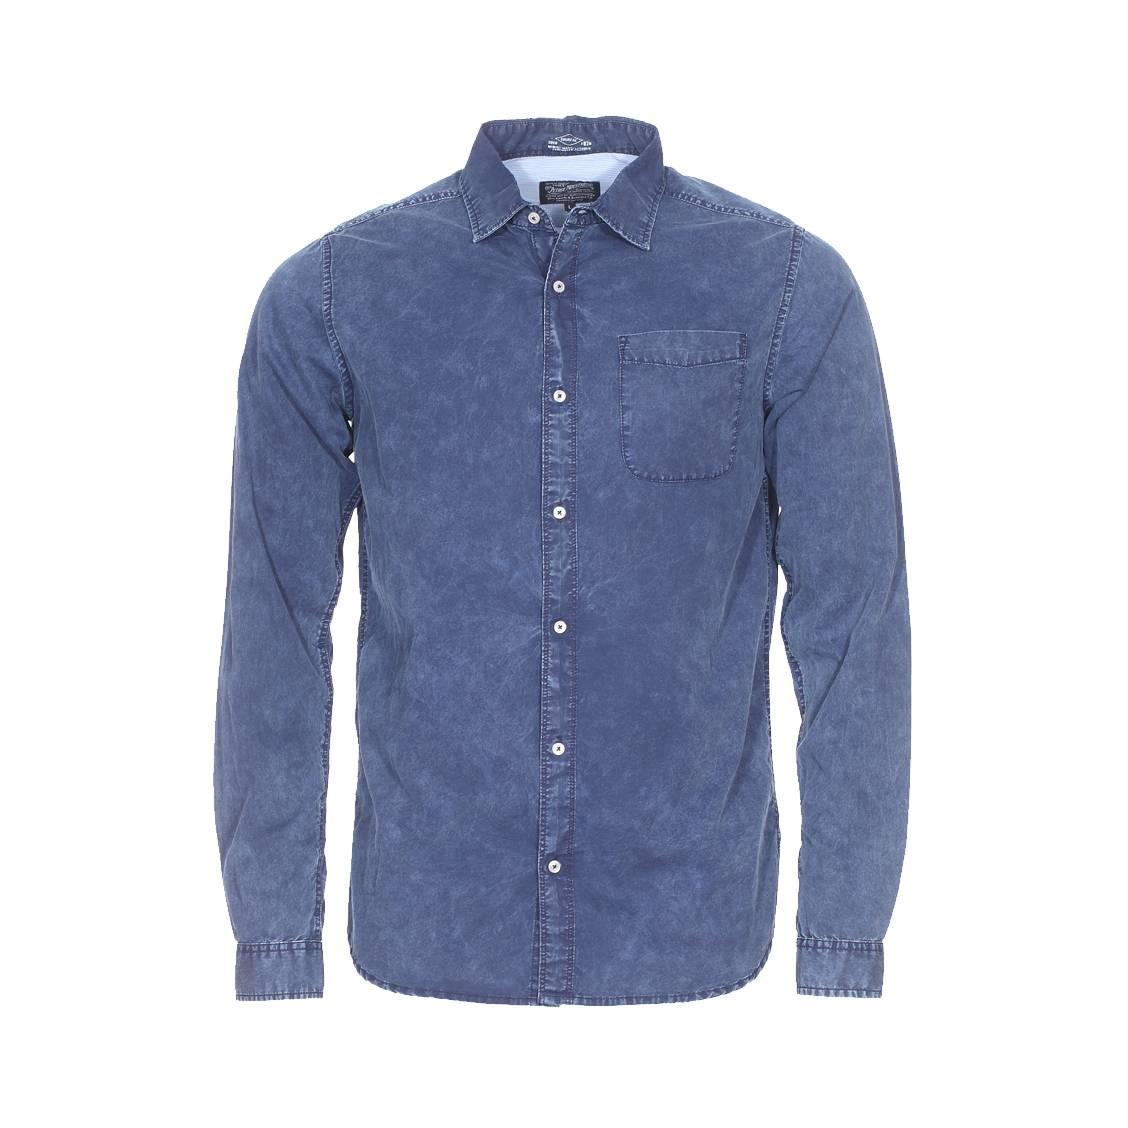 Chemise ajustée  en jean bleu indigo